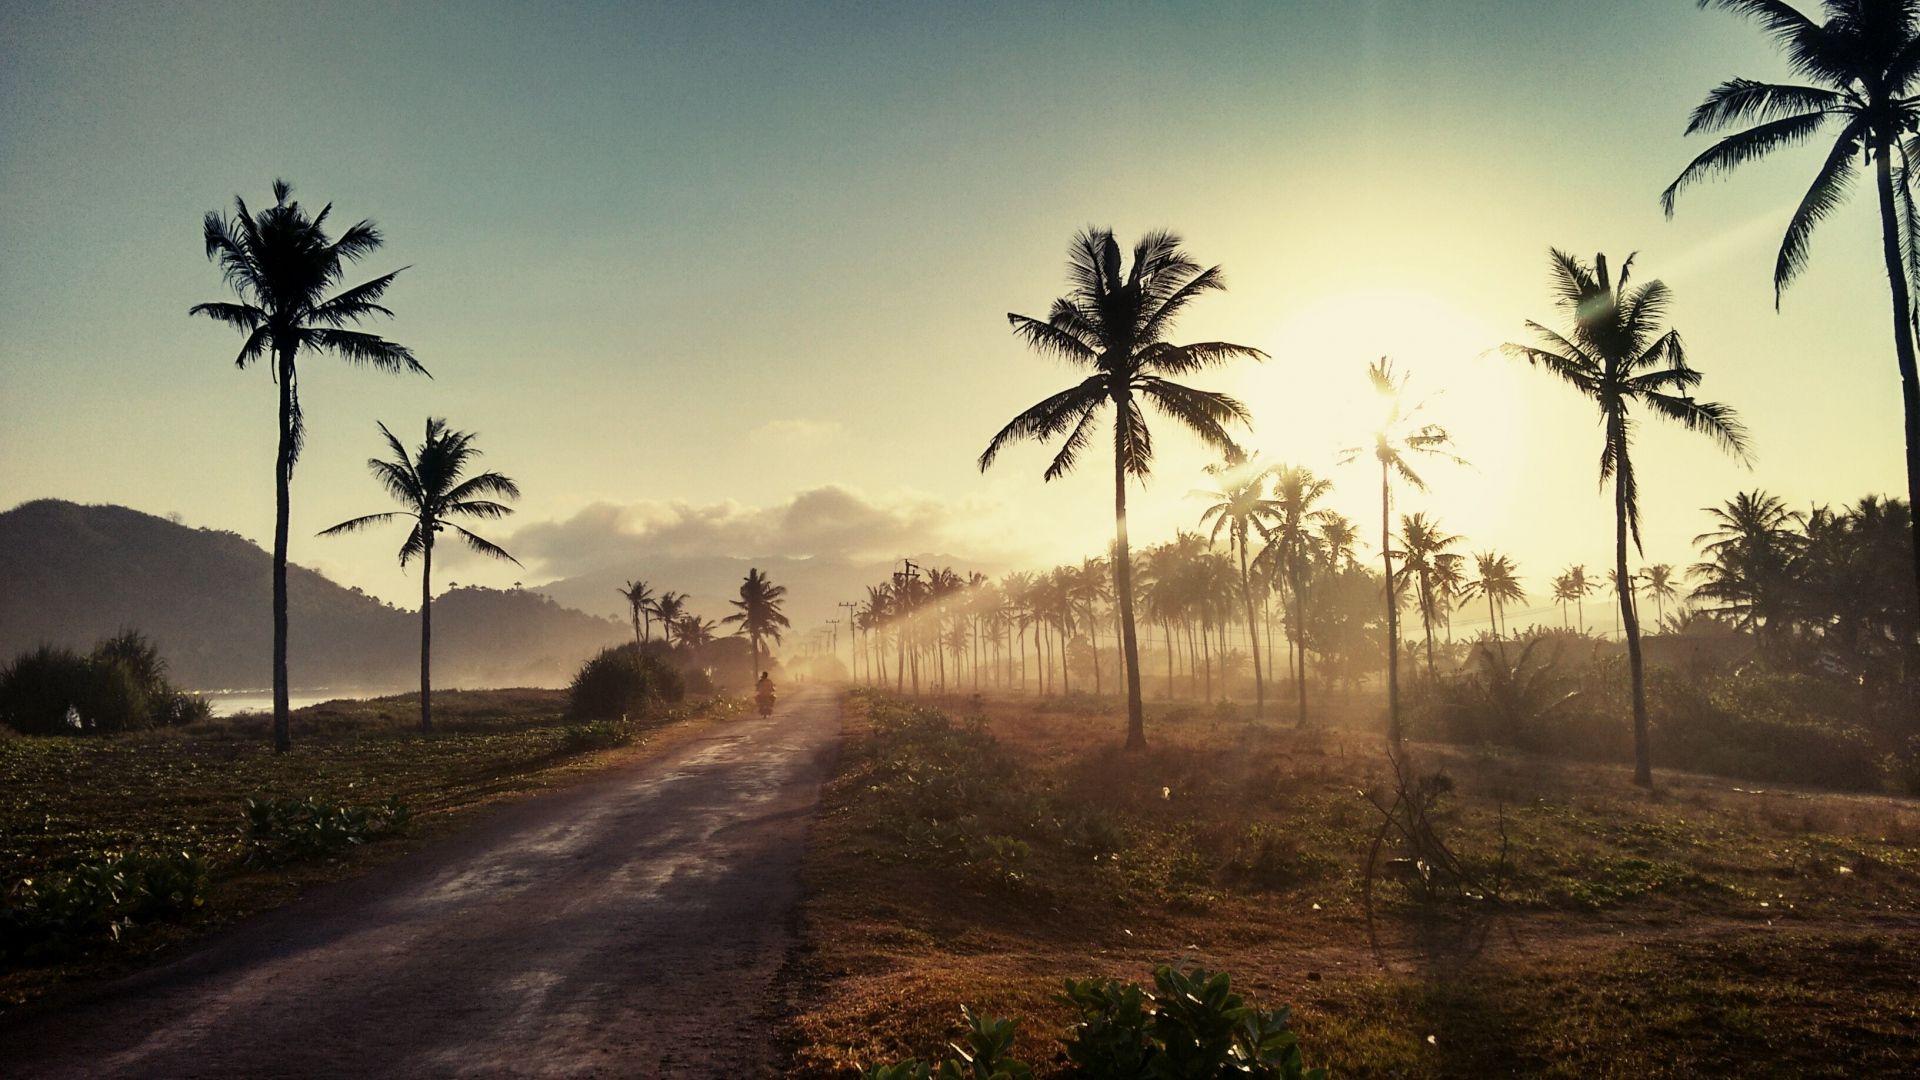 Palm Tree Sunset full hd image